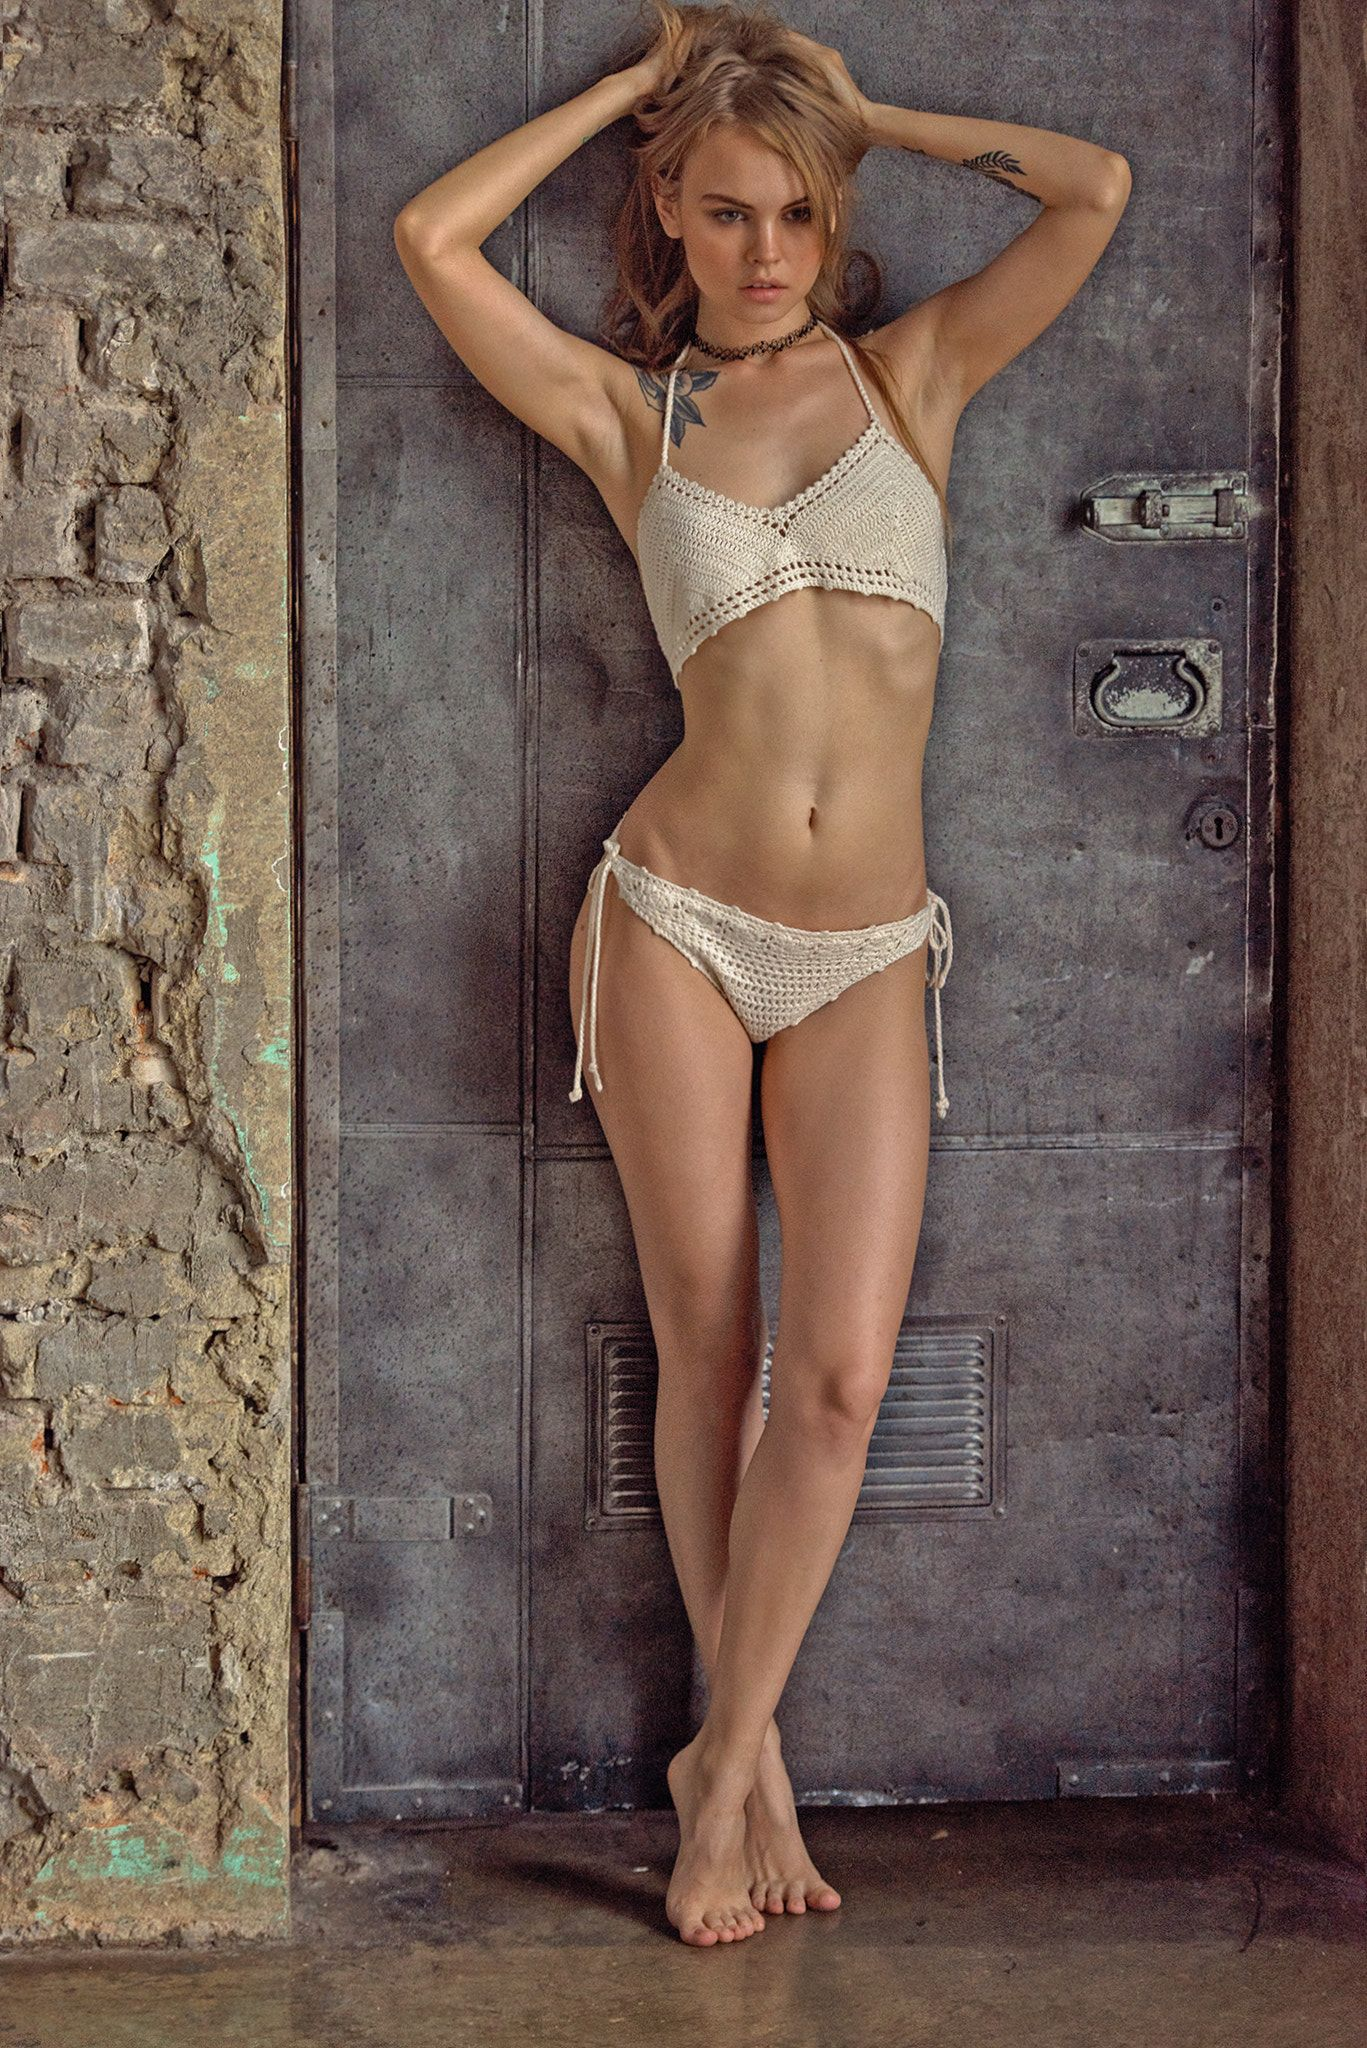 Mariah careys giant goddess legs get worshipped nudes (62 photos), Boobs Celebrity pictures